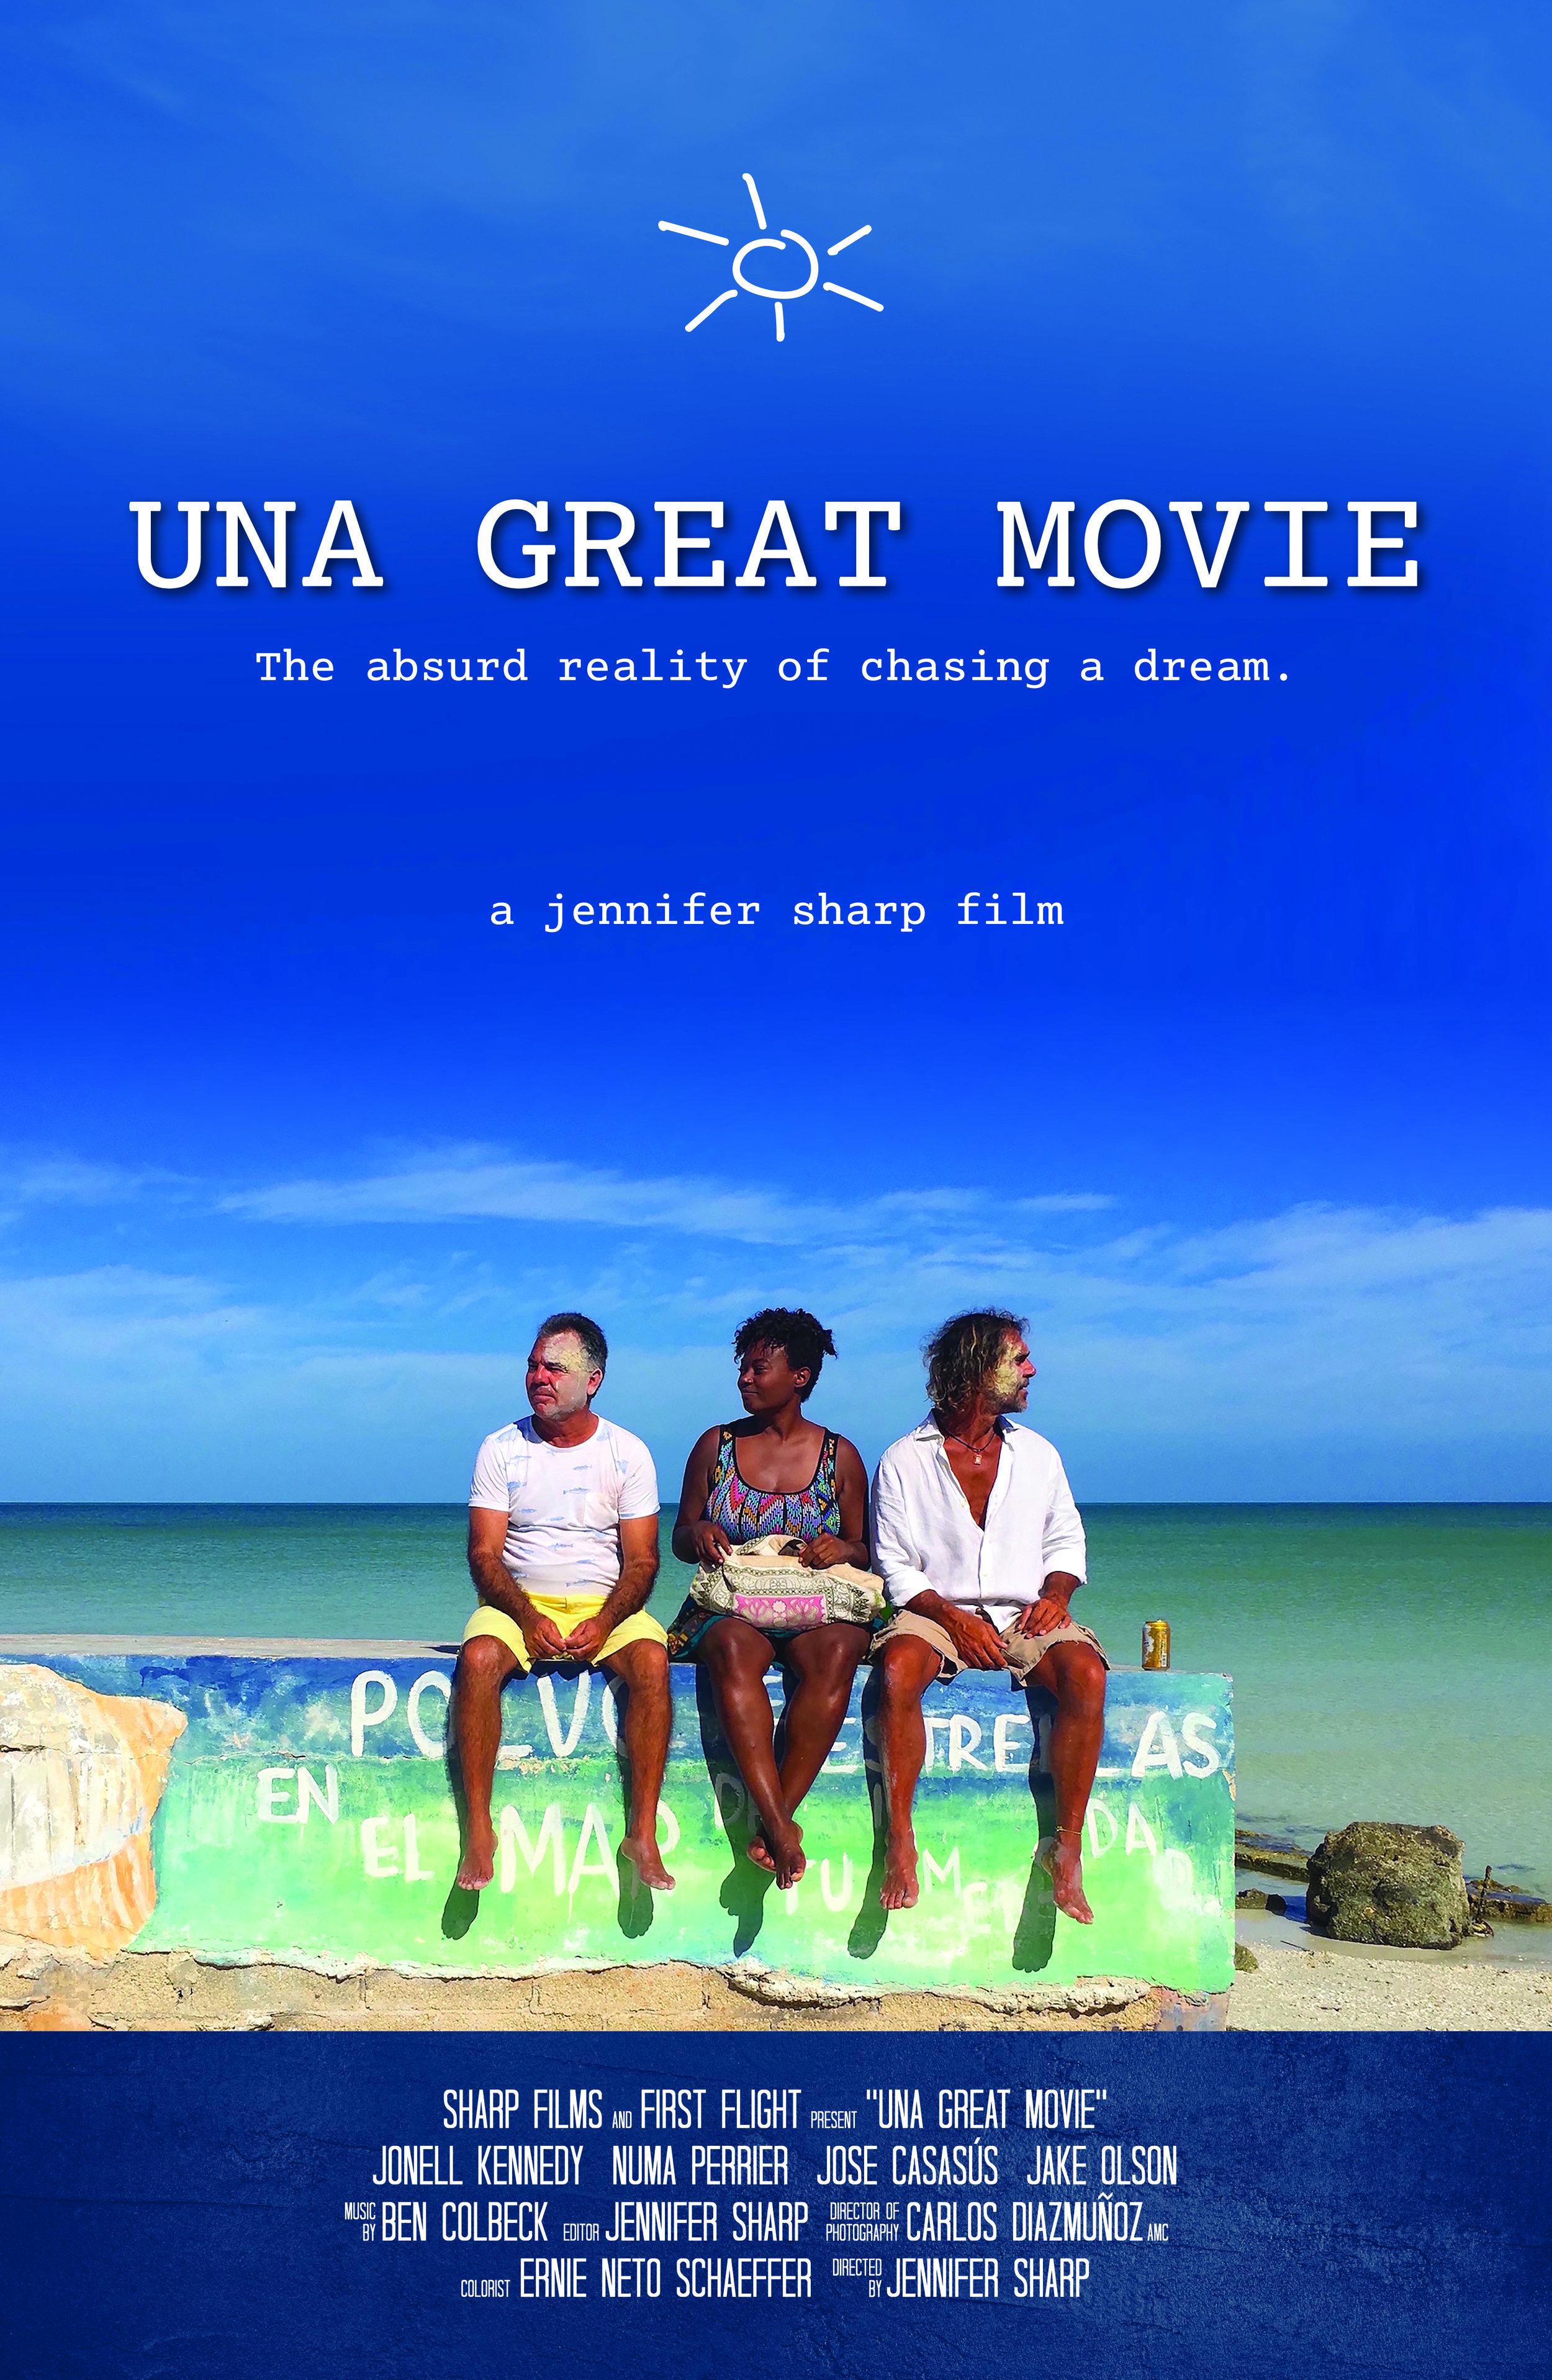 una_great_movie_poster_11x17.jpg